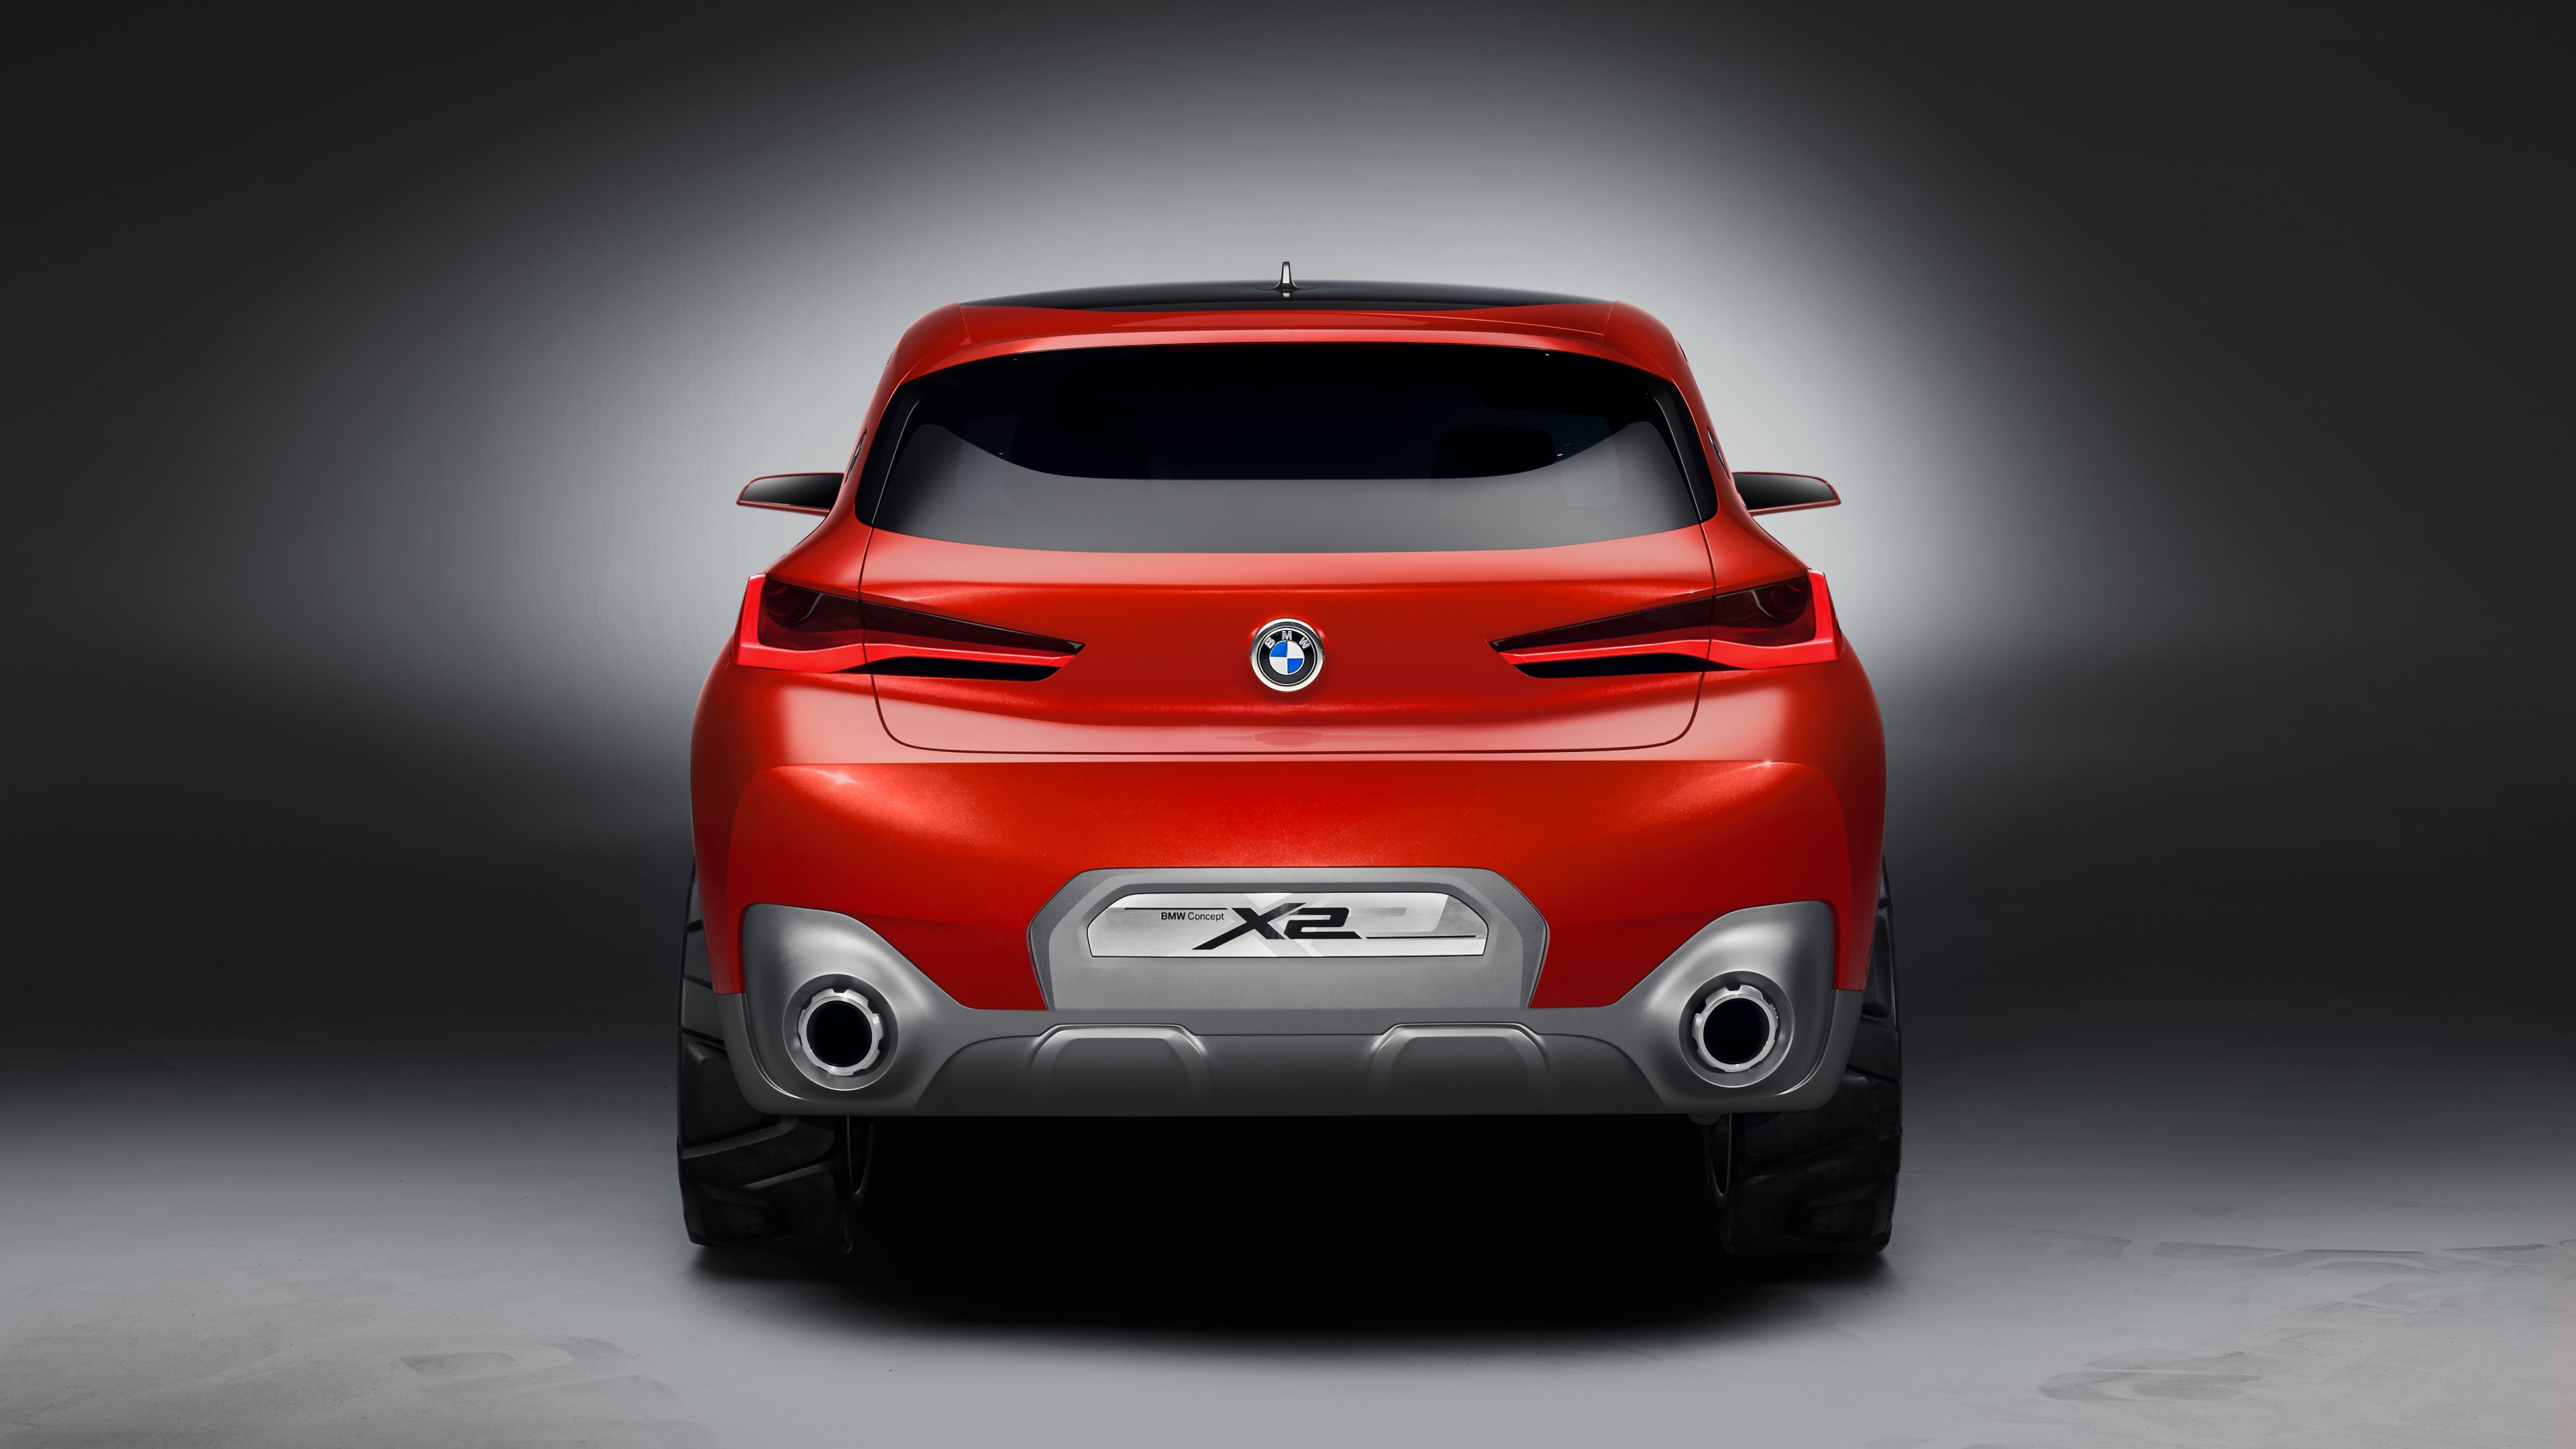 2018 BMW X2 Concept 3 Wallpaper | HD Car Wallpapers | ID #7313